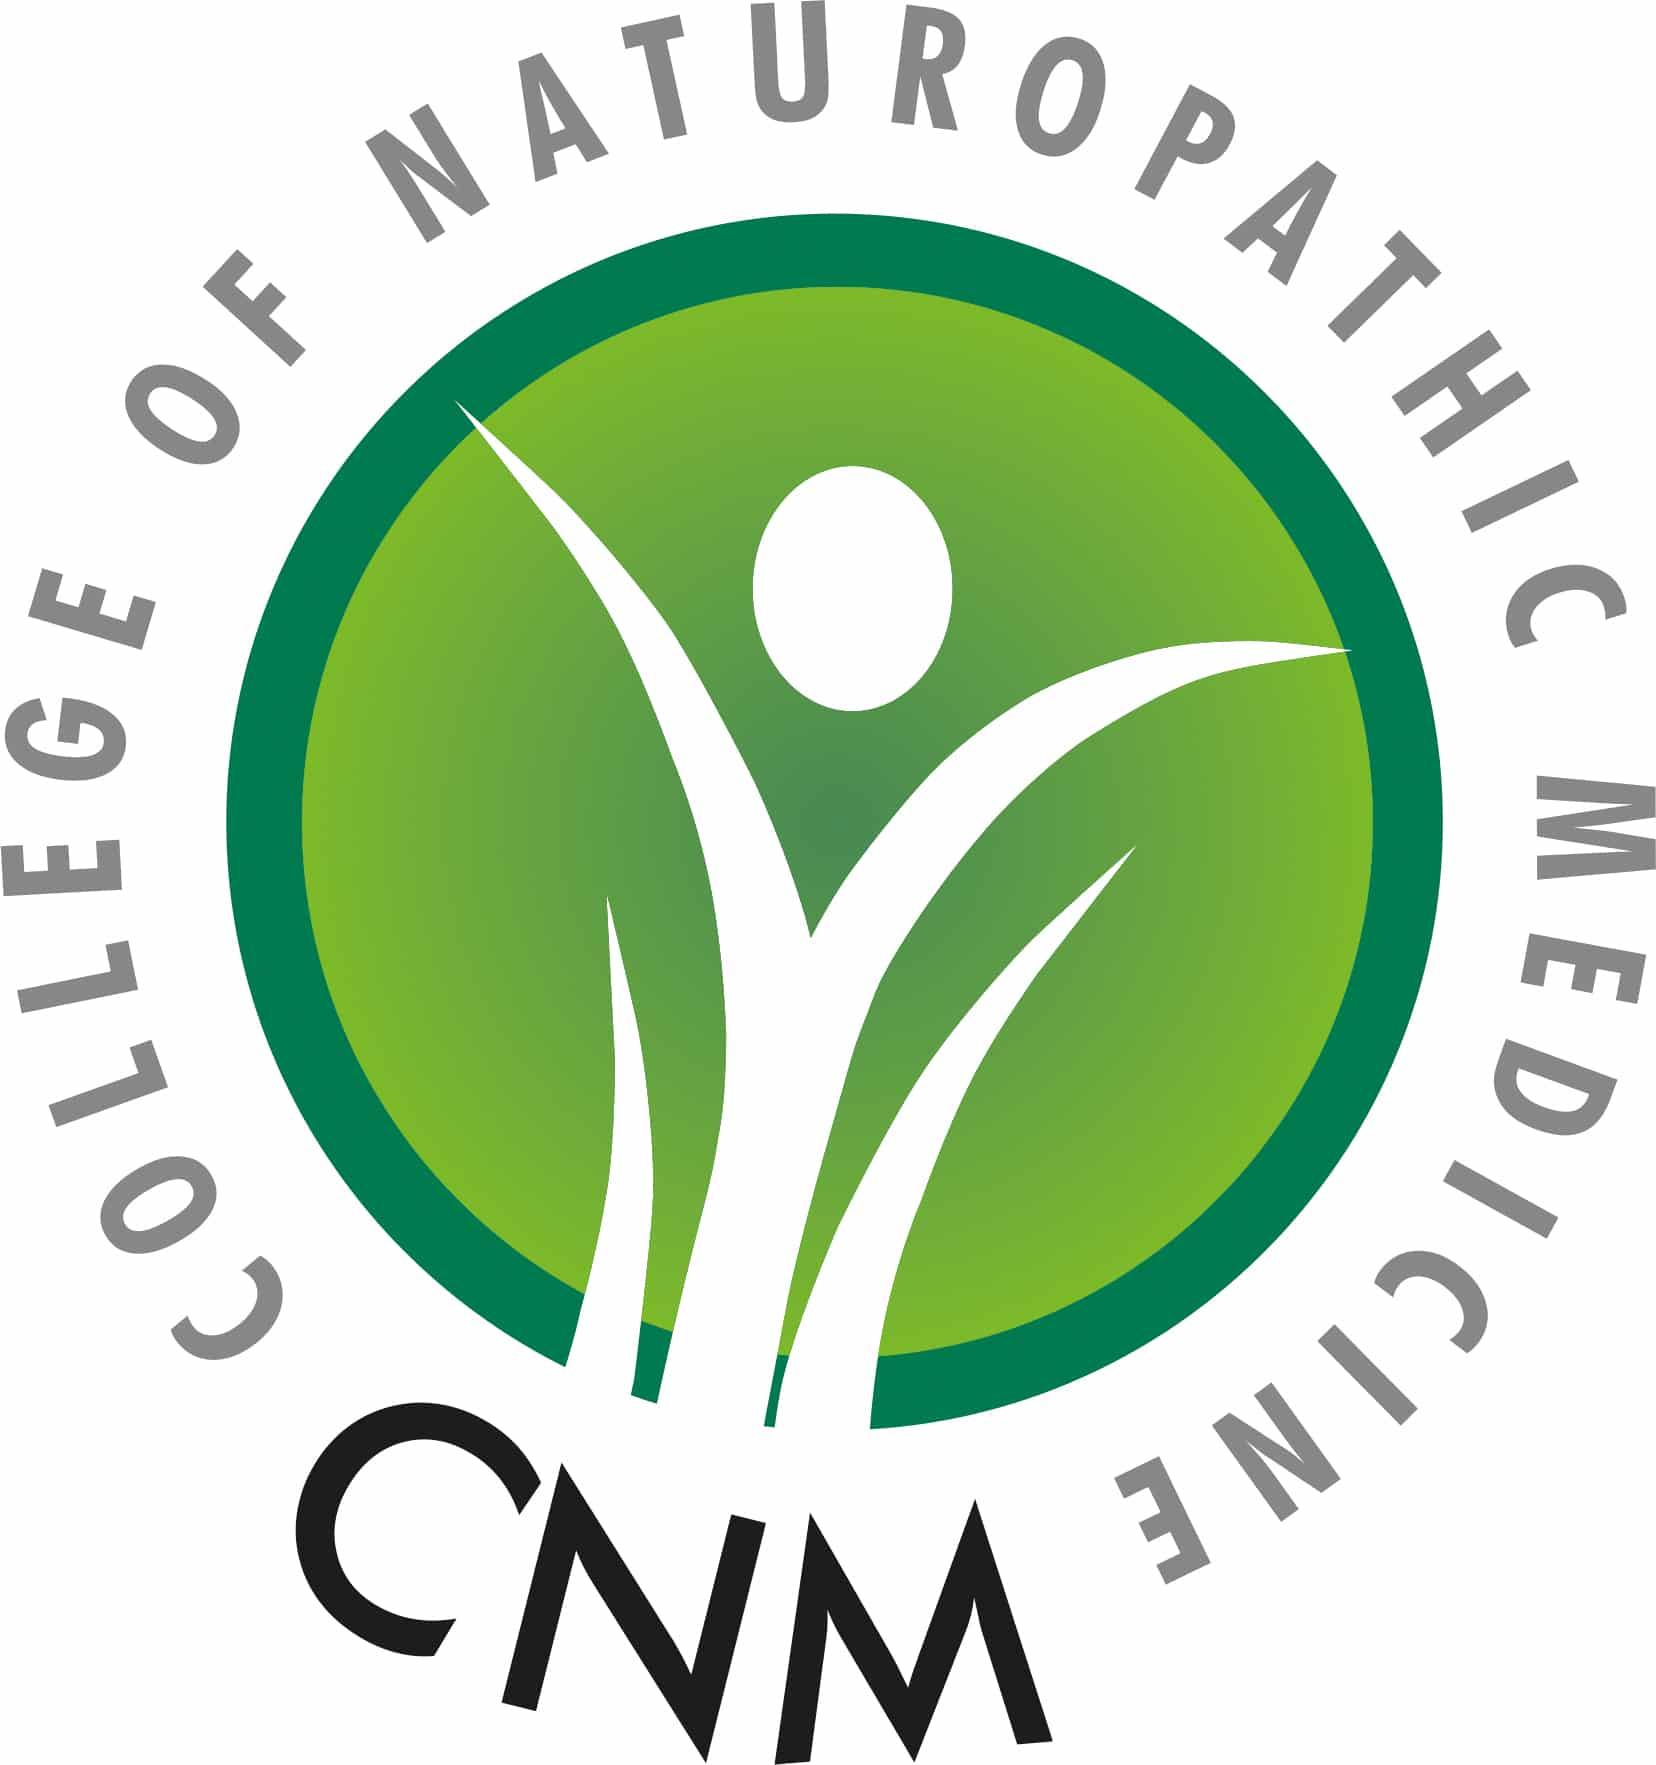 CNM The College of Naturopathic Medicine